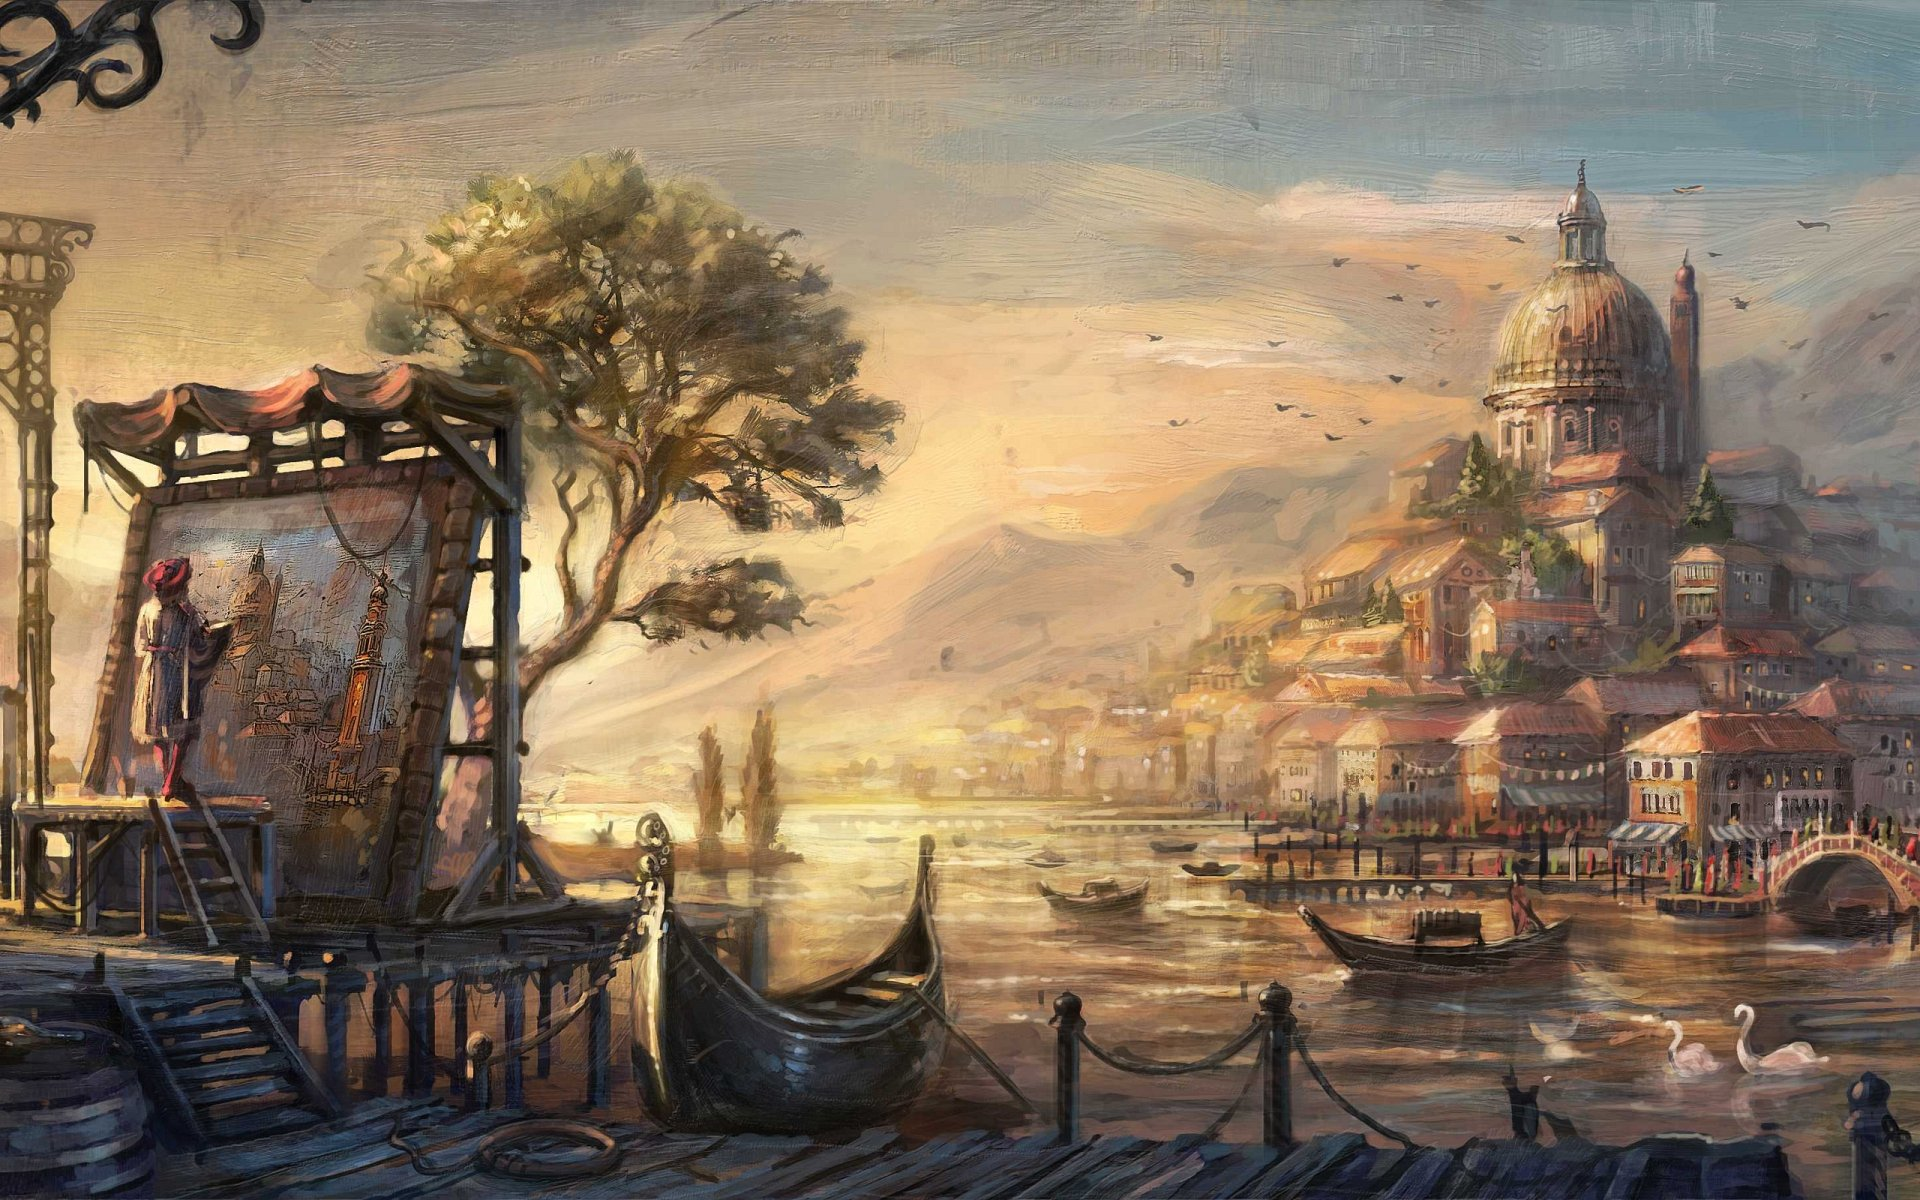 Theme famous painting artist painter brush oil on canvas 1920x1200